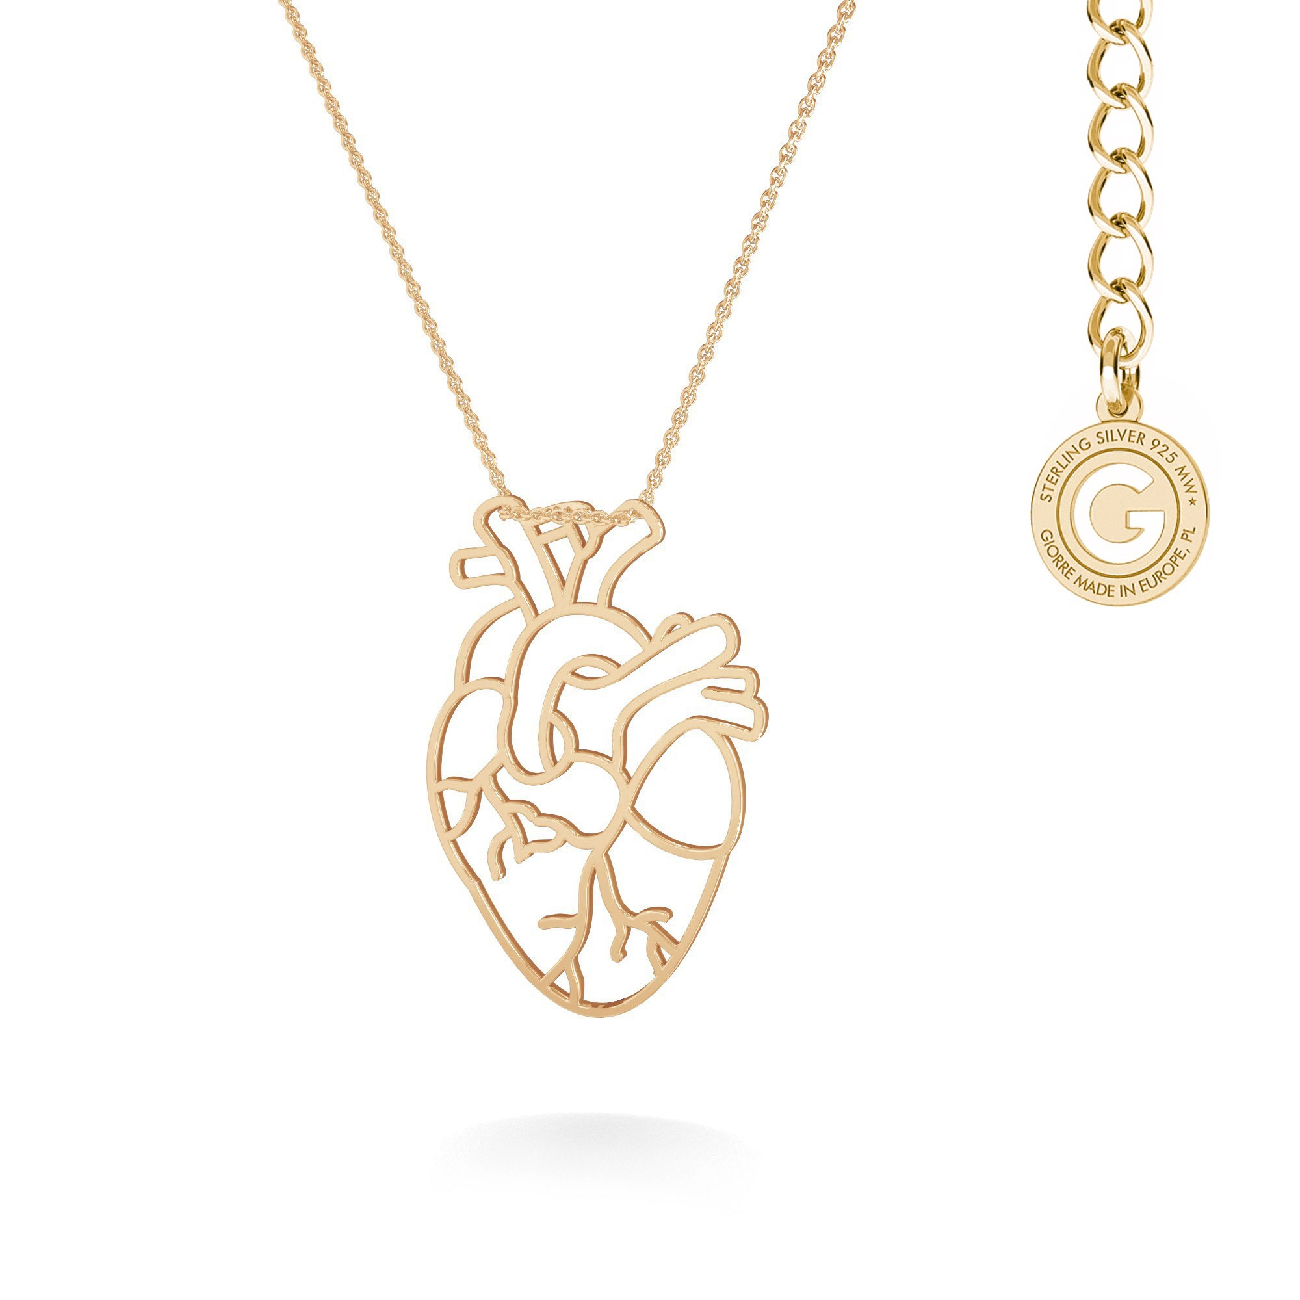 Naszyjnik MON DÉFI serce anatomiczne srebro 925